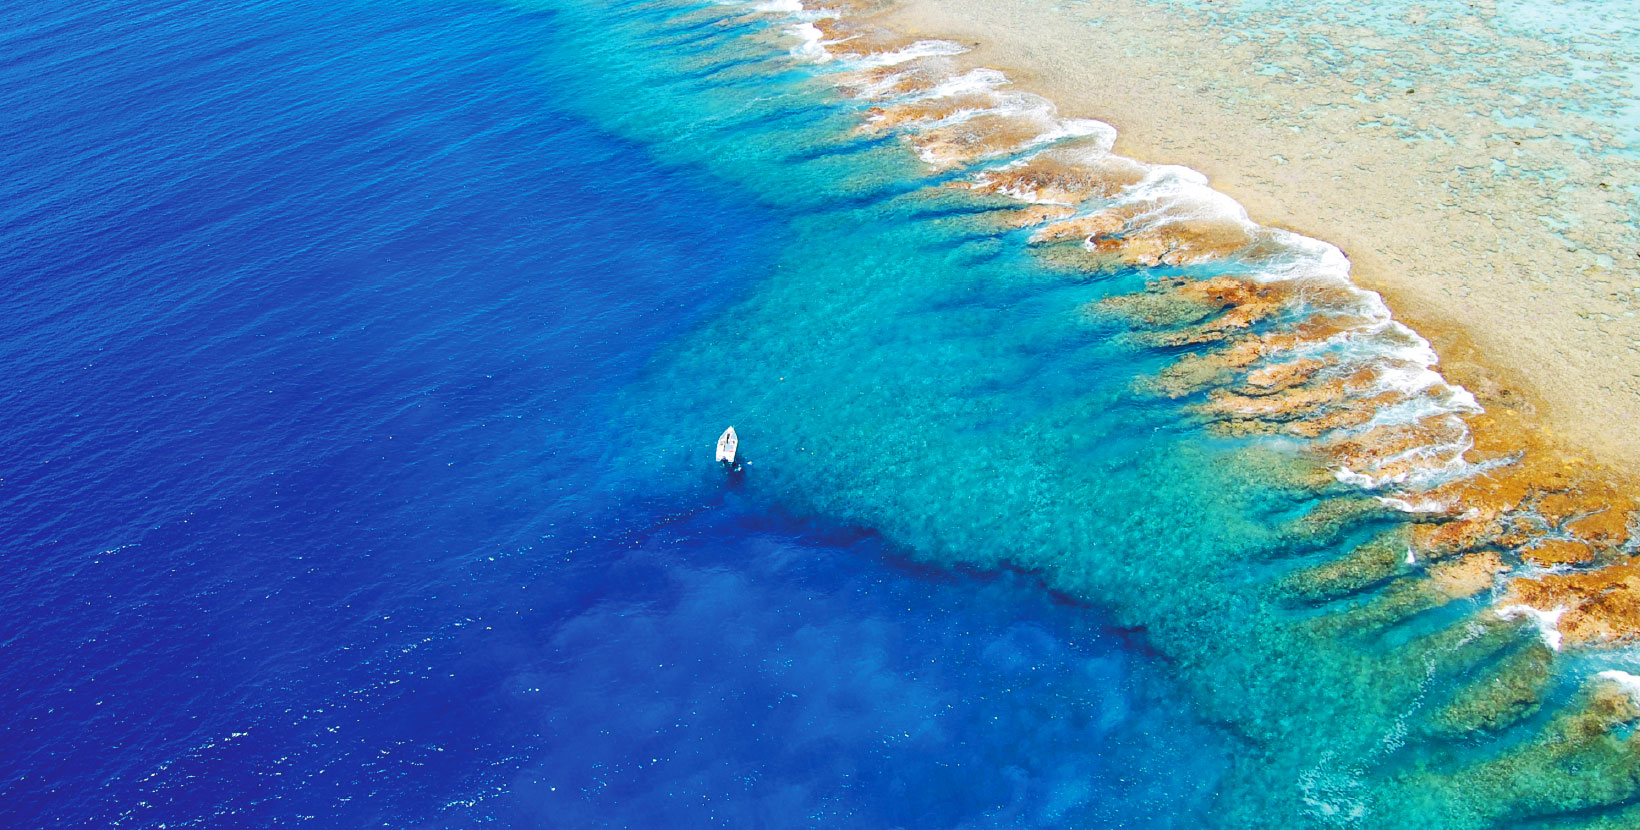 tetiaroa-island-1.jpg